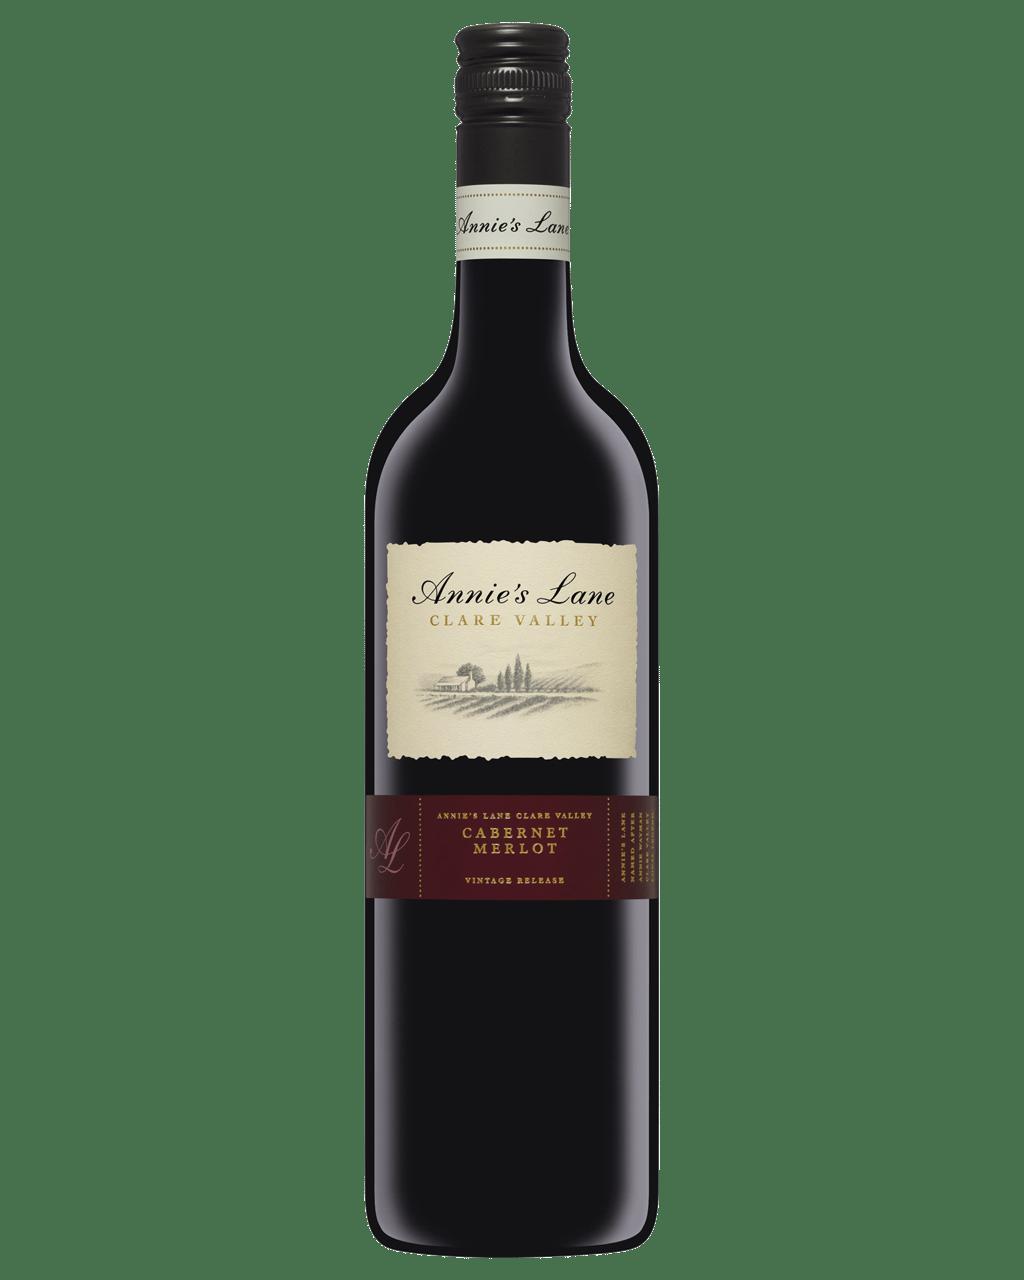 52fdb593f3 Annie's Lane Cabernet Merlot 2013 | Dan Murphy's | Buy Wine ...